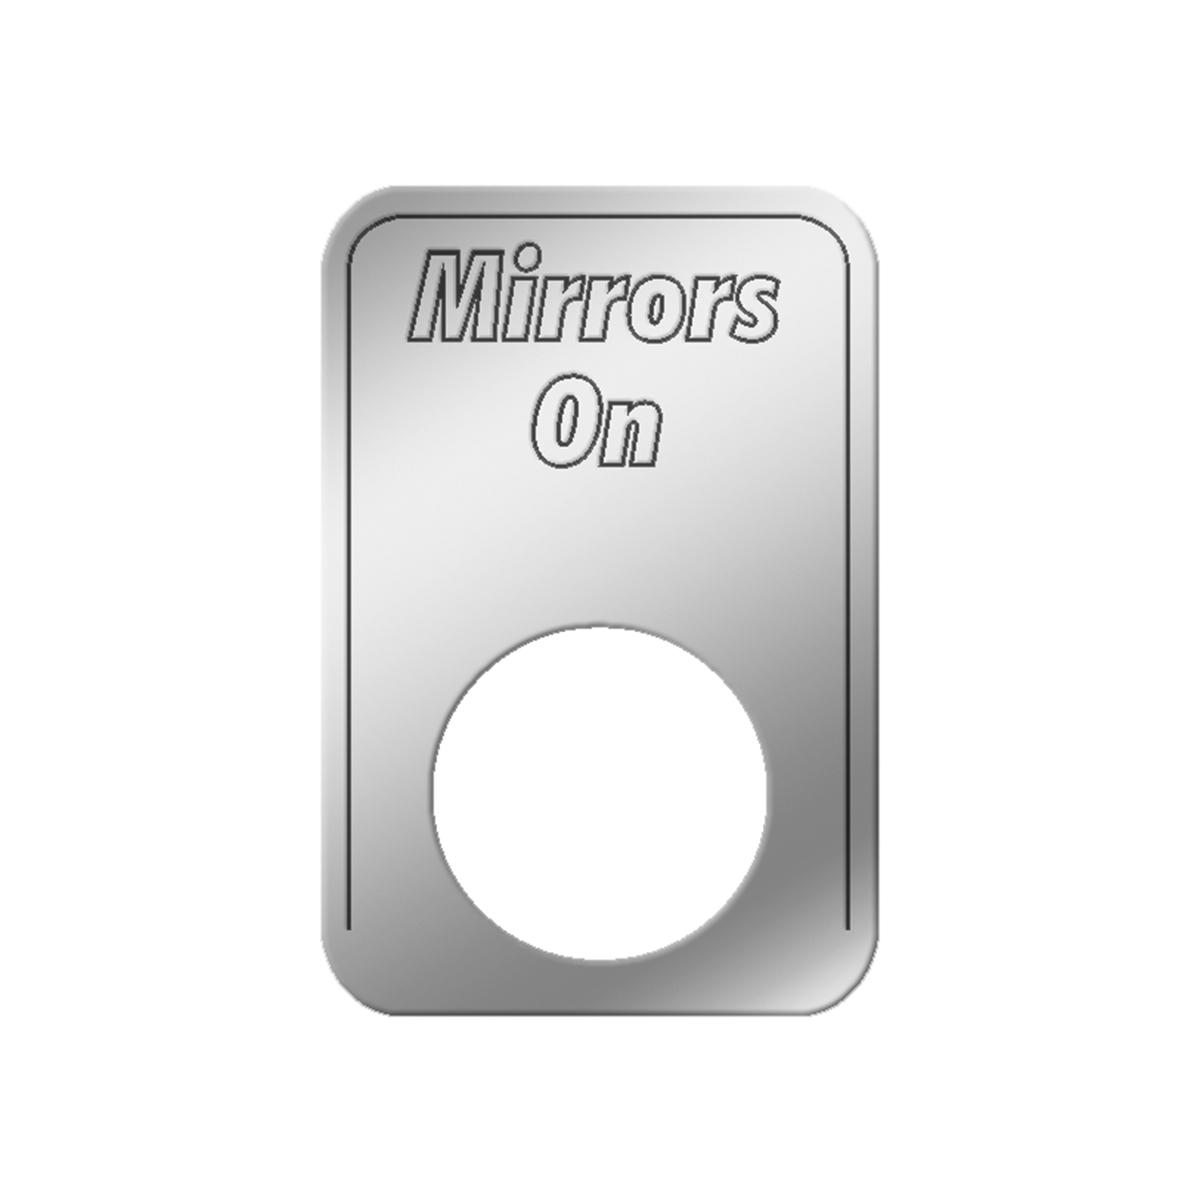 #68556 Mirror Heat Indicator Light